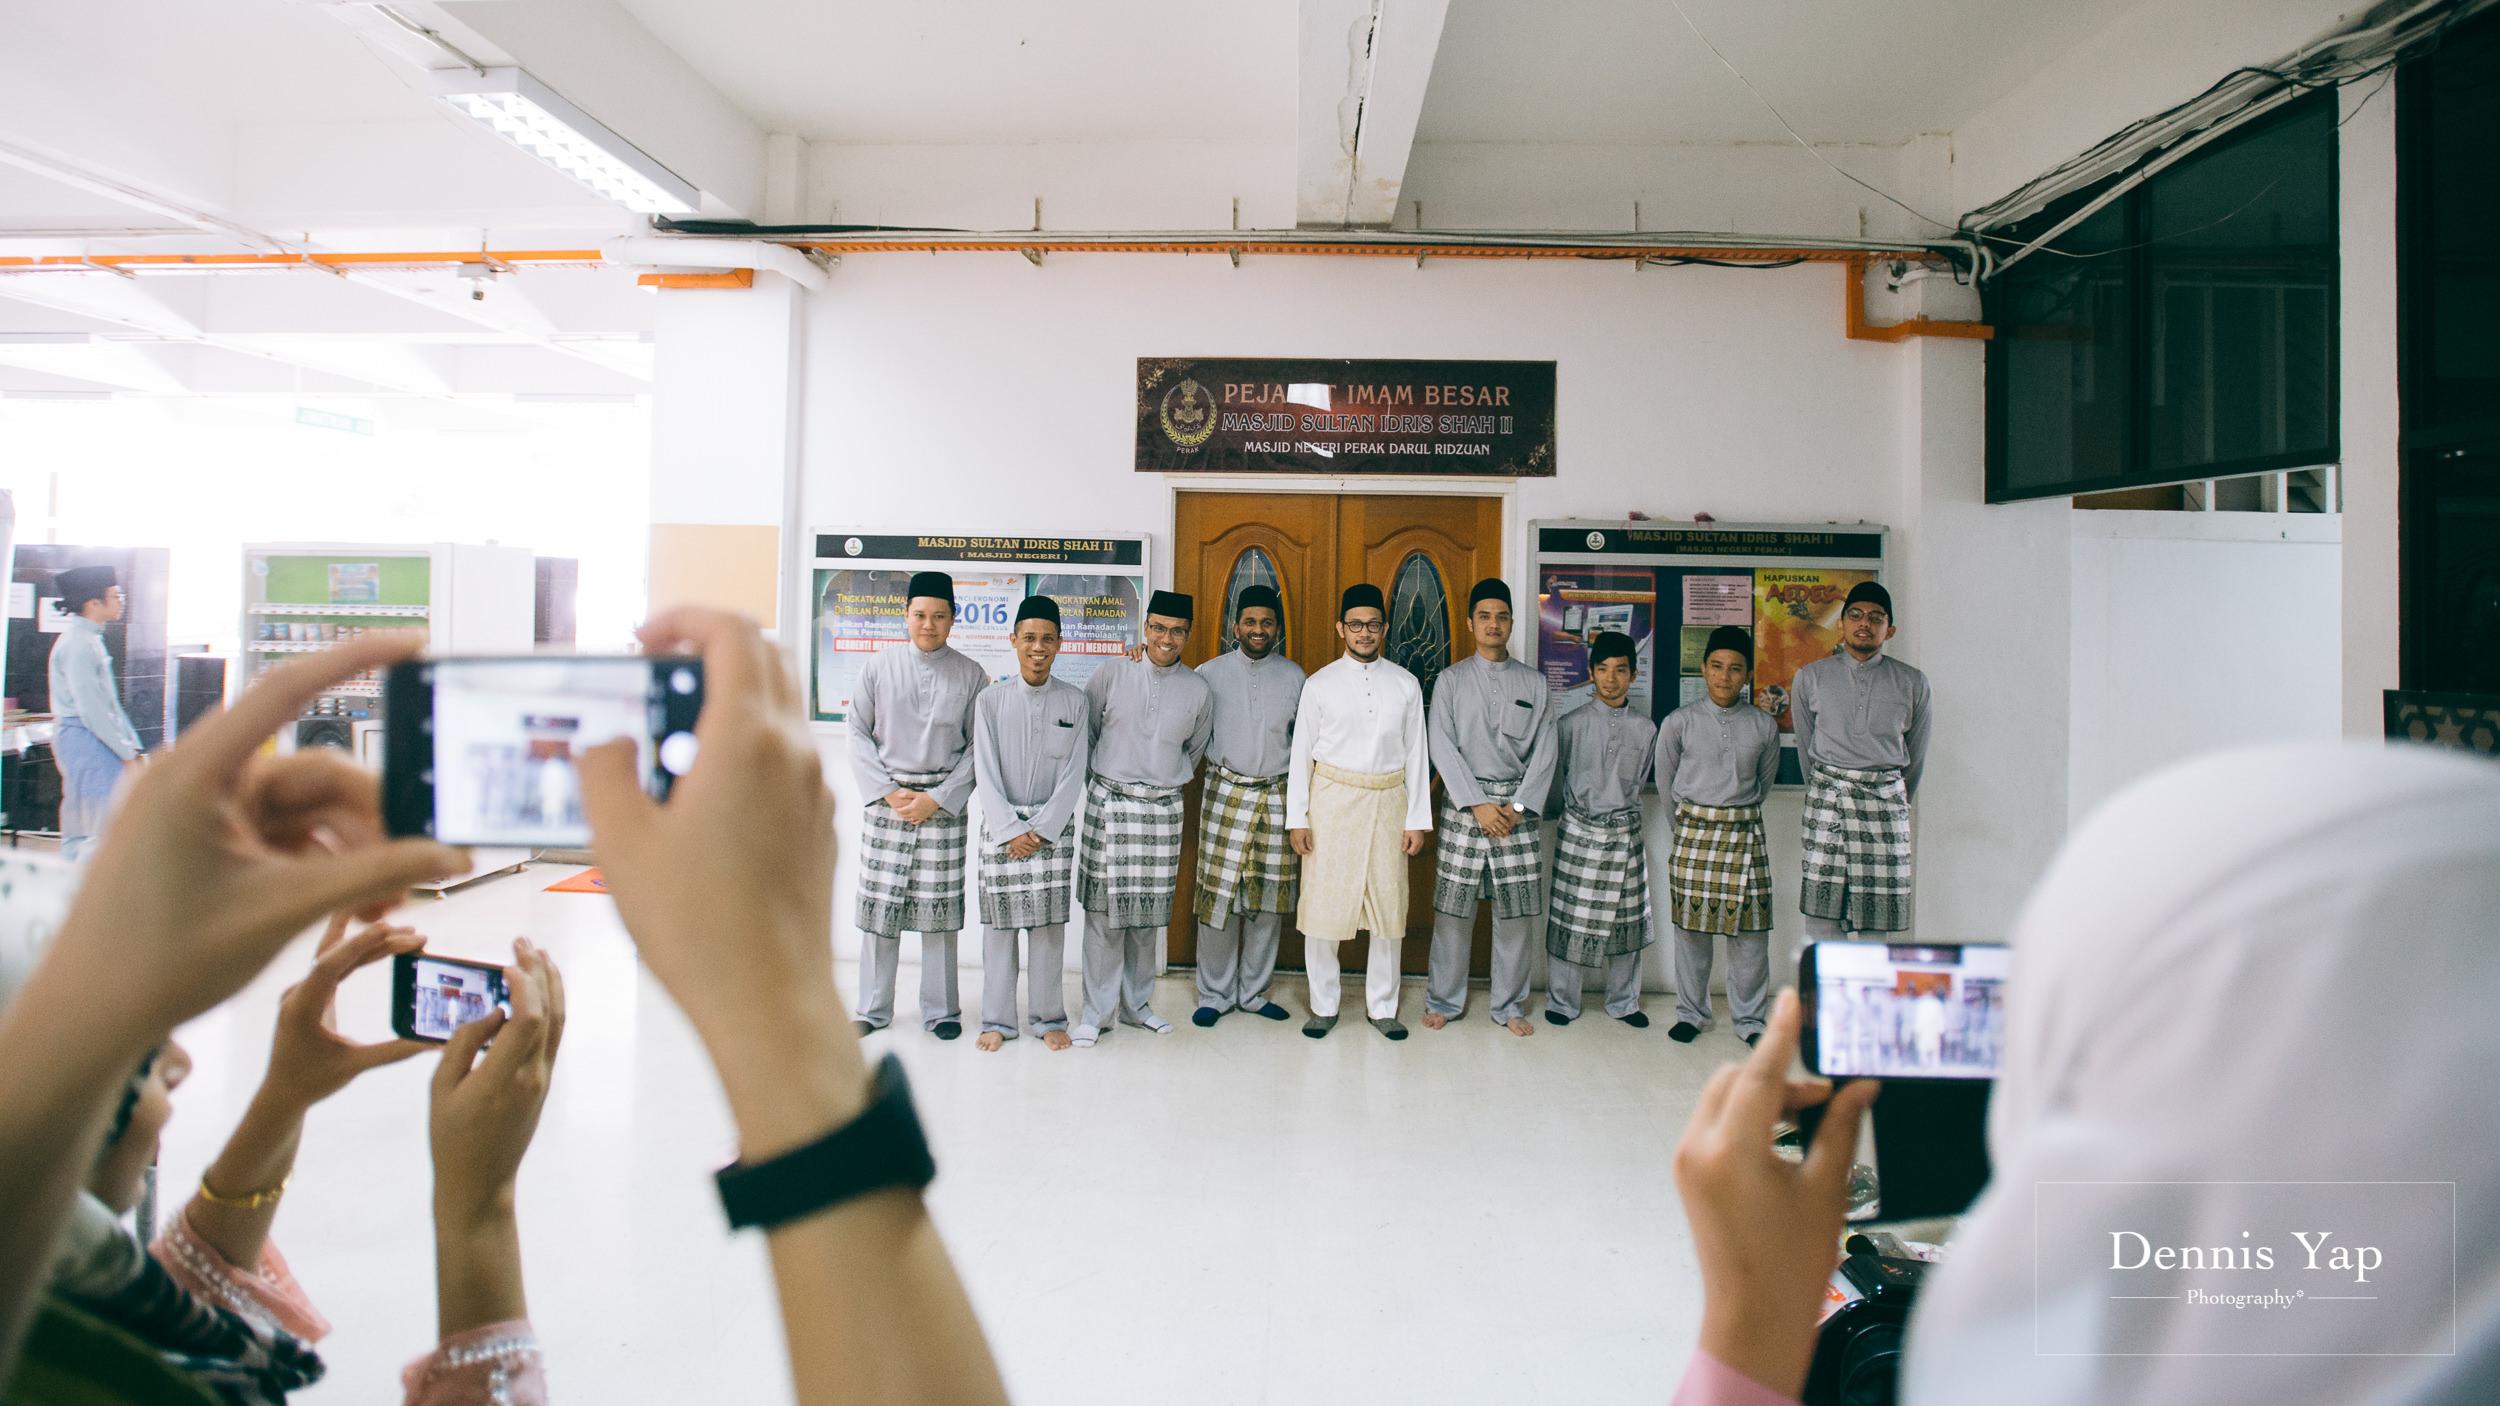 zarif hanalili malay wedding ceremony dennis yap photography-11.jpg